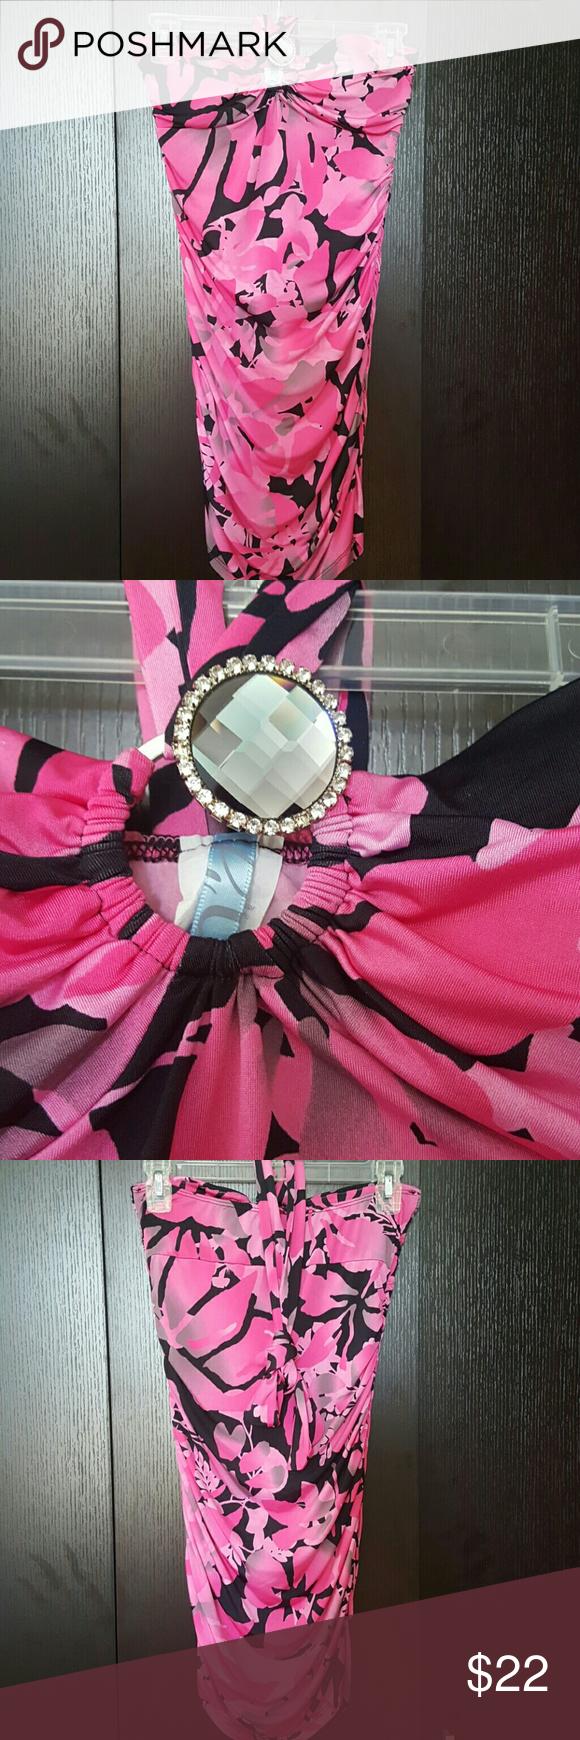 Pink/black design short halter dress Pink/ black design short halter dress size medium juniors or petite size Dresses Mini